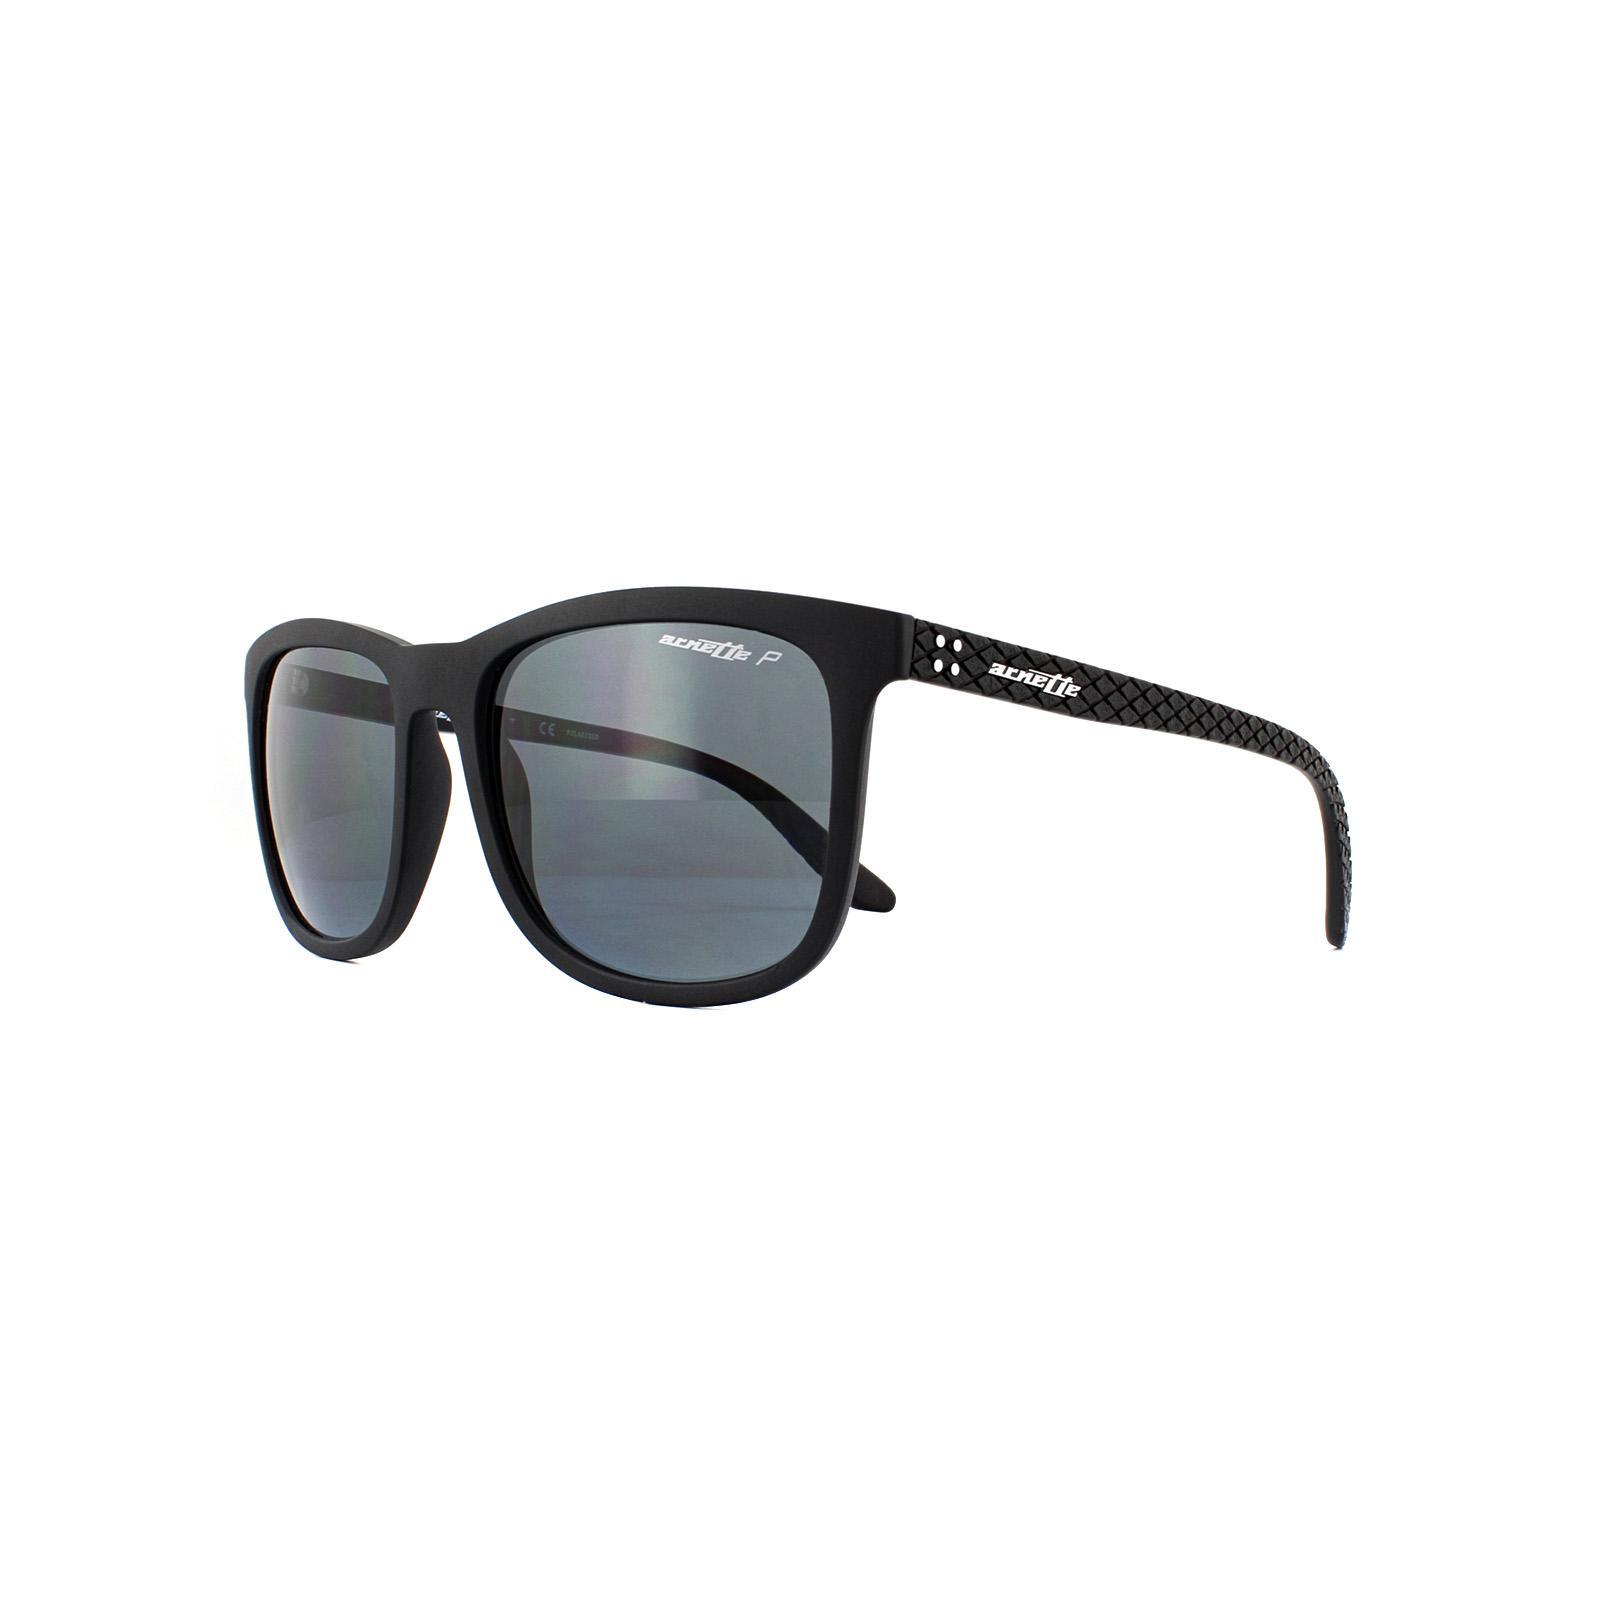 7da9ada82e383 Sentinel Arnette Sunglasses Chenga 4240 01 81 Matte Black Grey Polarized